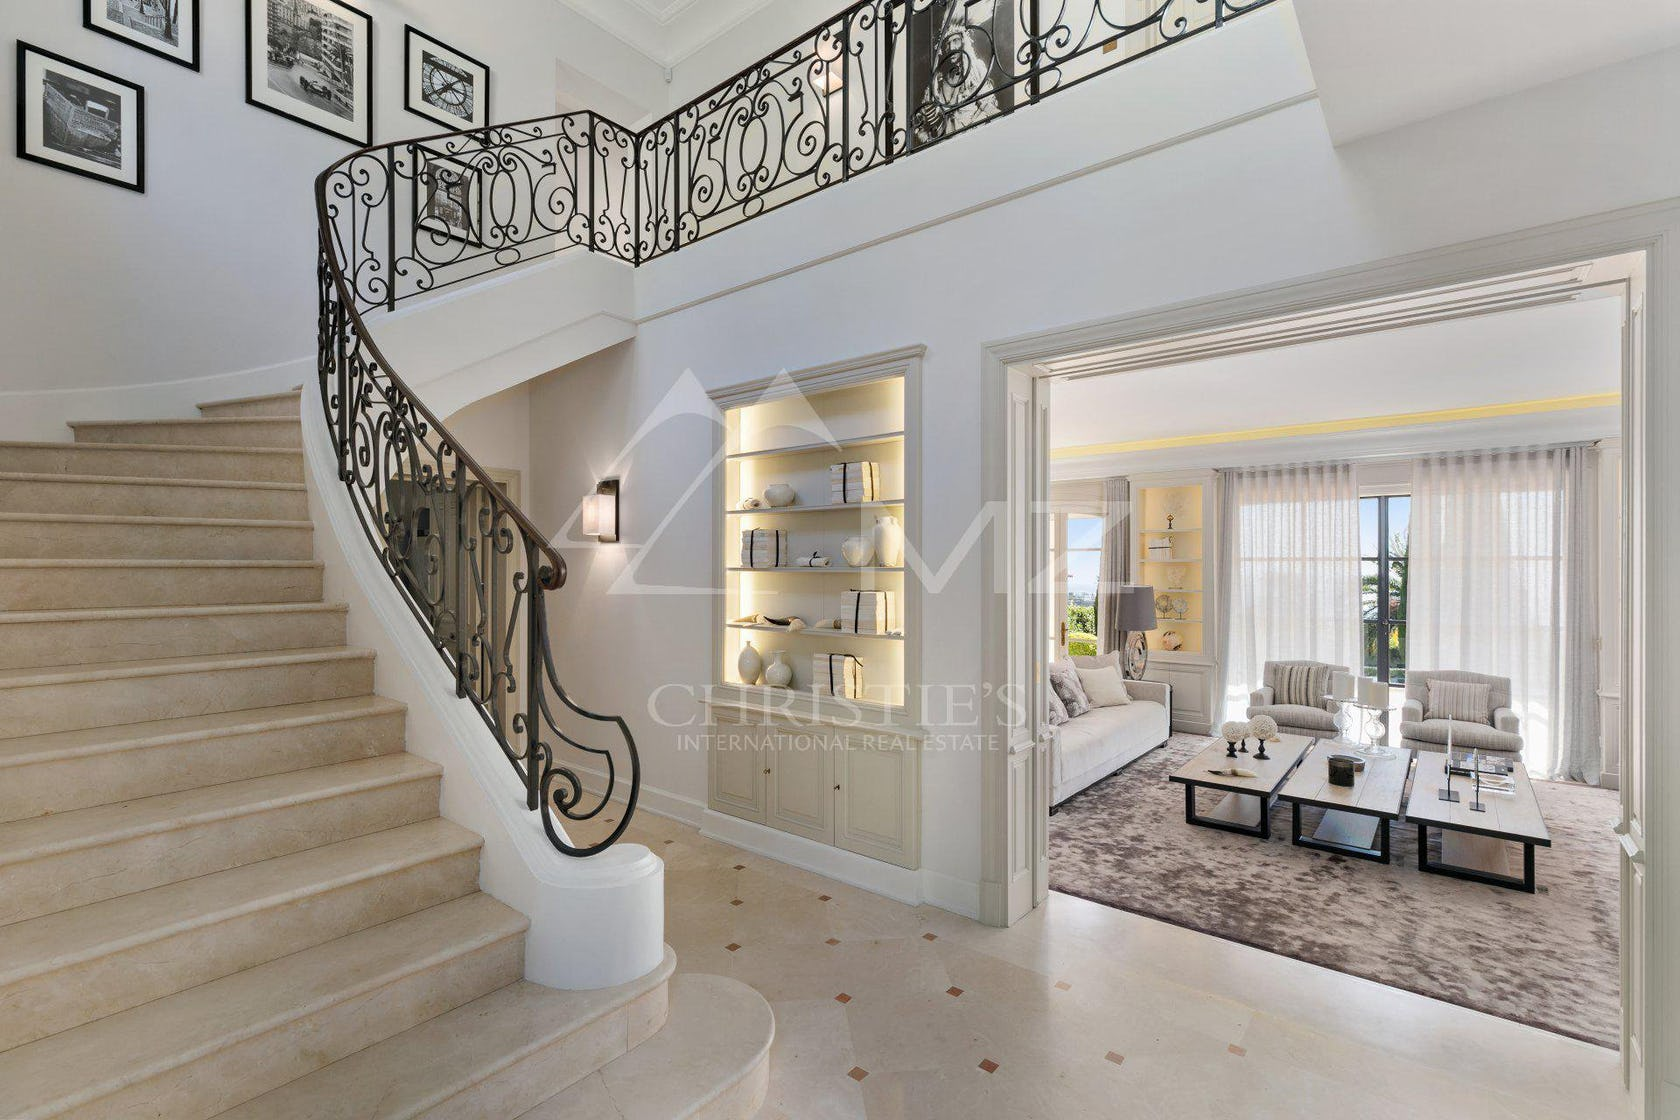 handrail banister staircase interior design indoors